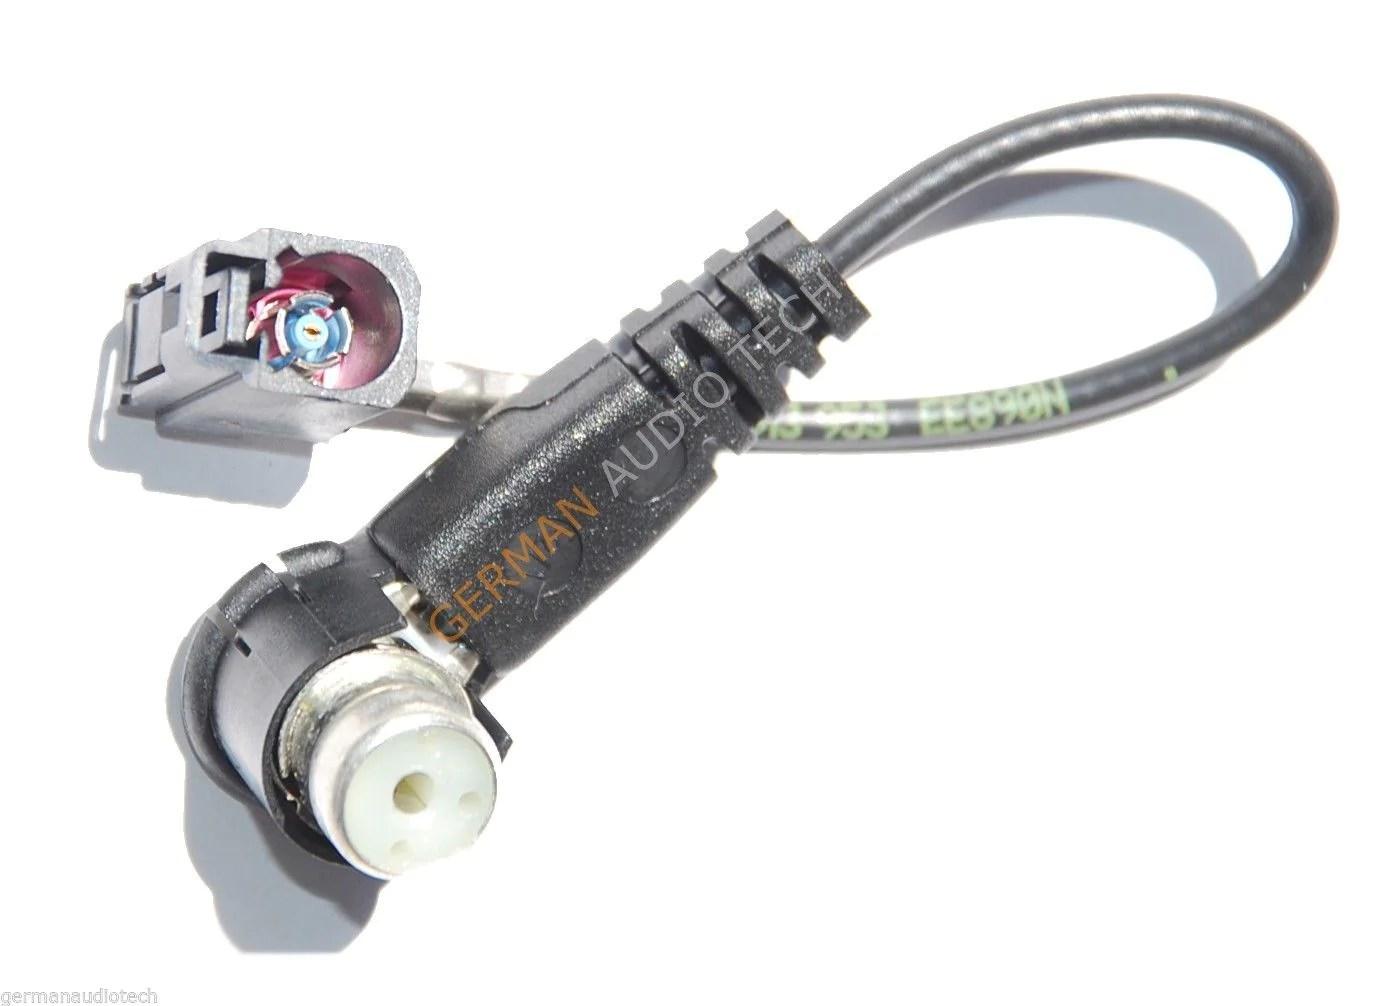 small resolution of antenna adapter for bmw radio harness cable business cd mini e46 m3 e39 m5 e53 x5